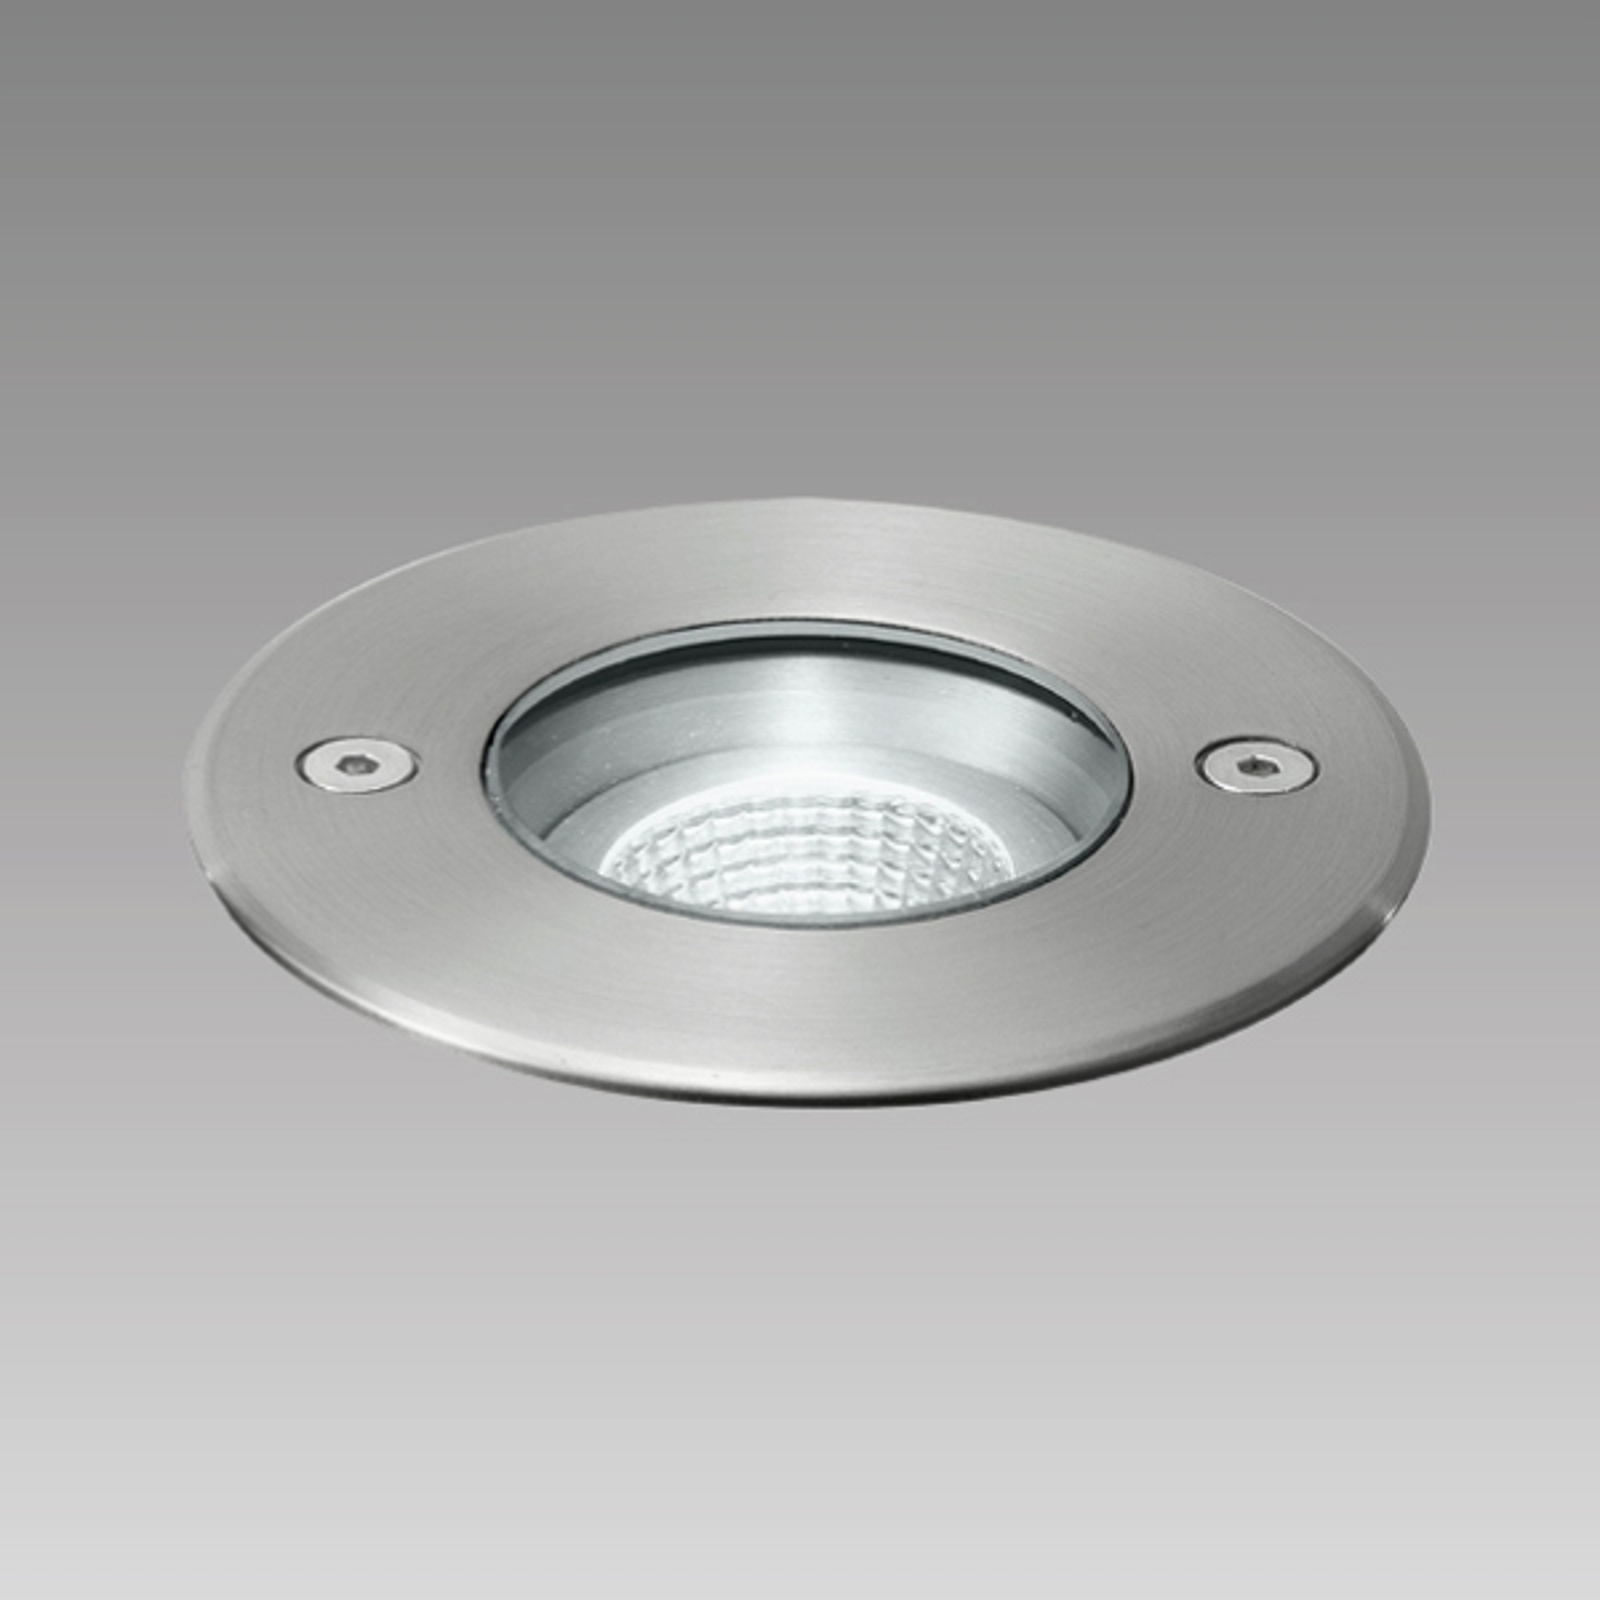 Uppokohdevalo Frisco ruostumaton teräs LED, IP67